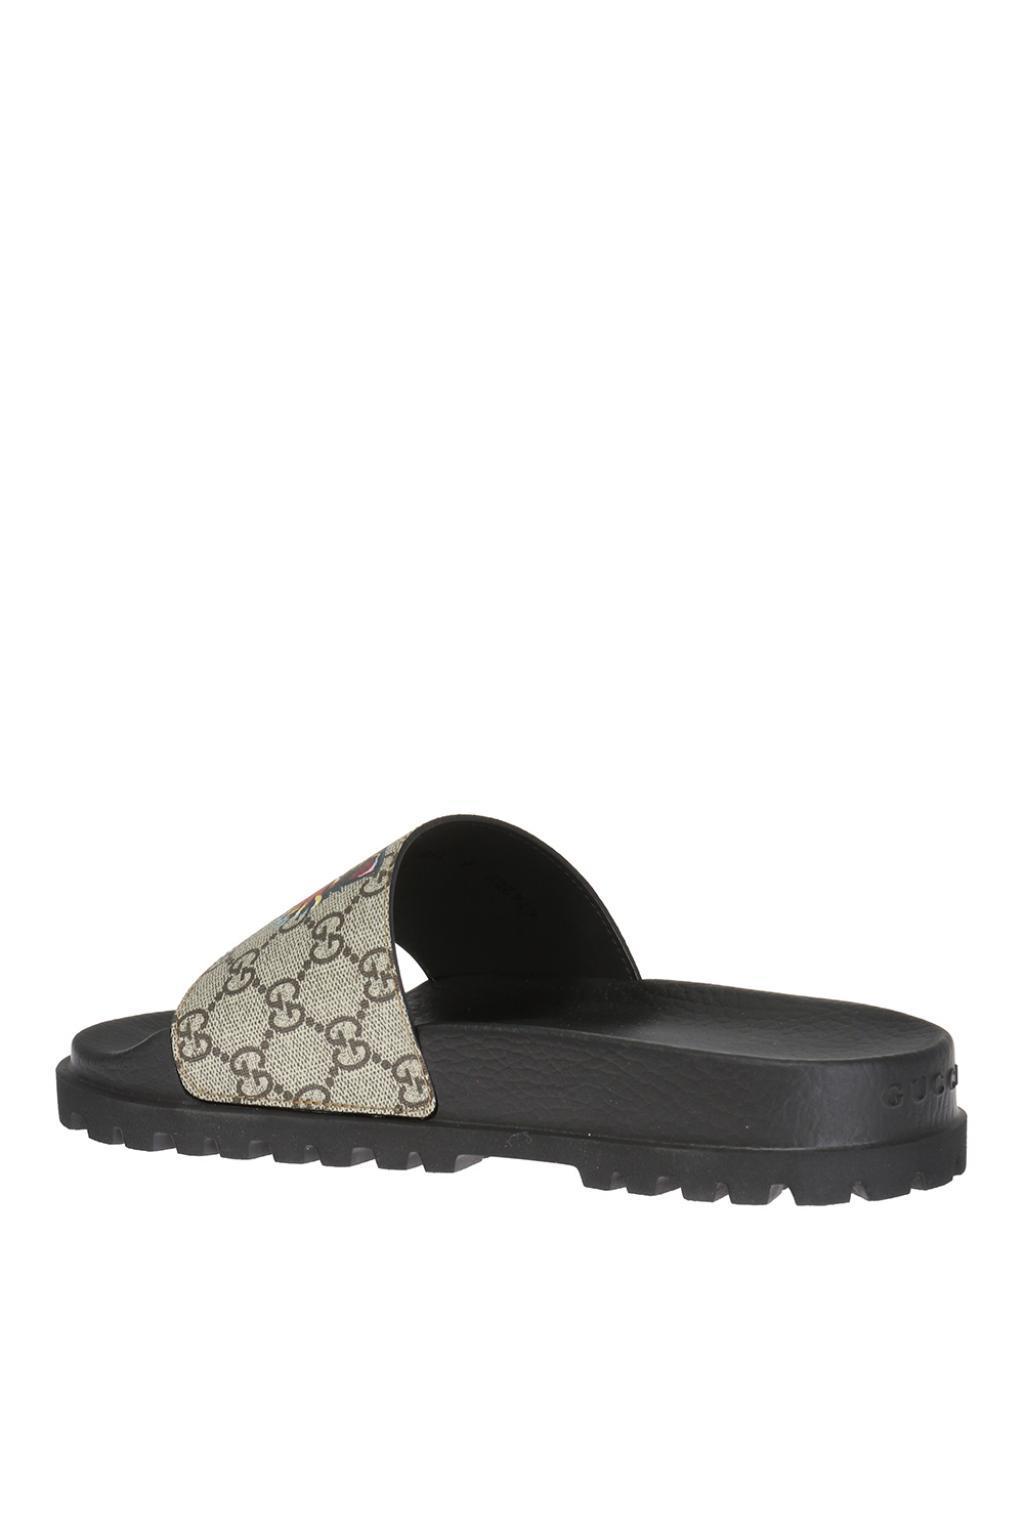 c79ff3db8b1 Lyst - Gucci Tiger Head Slides in Black for Men